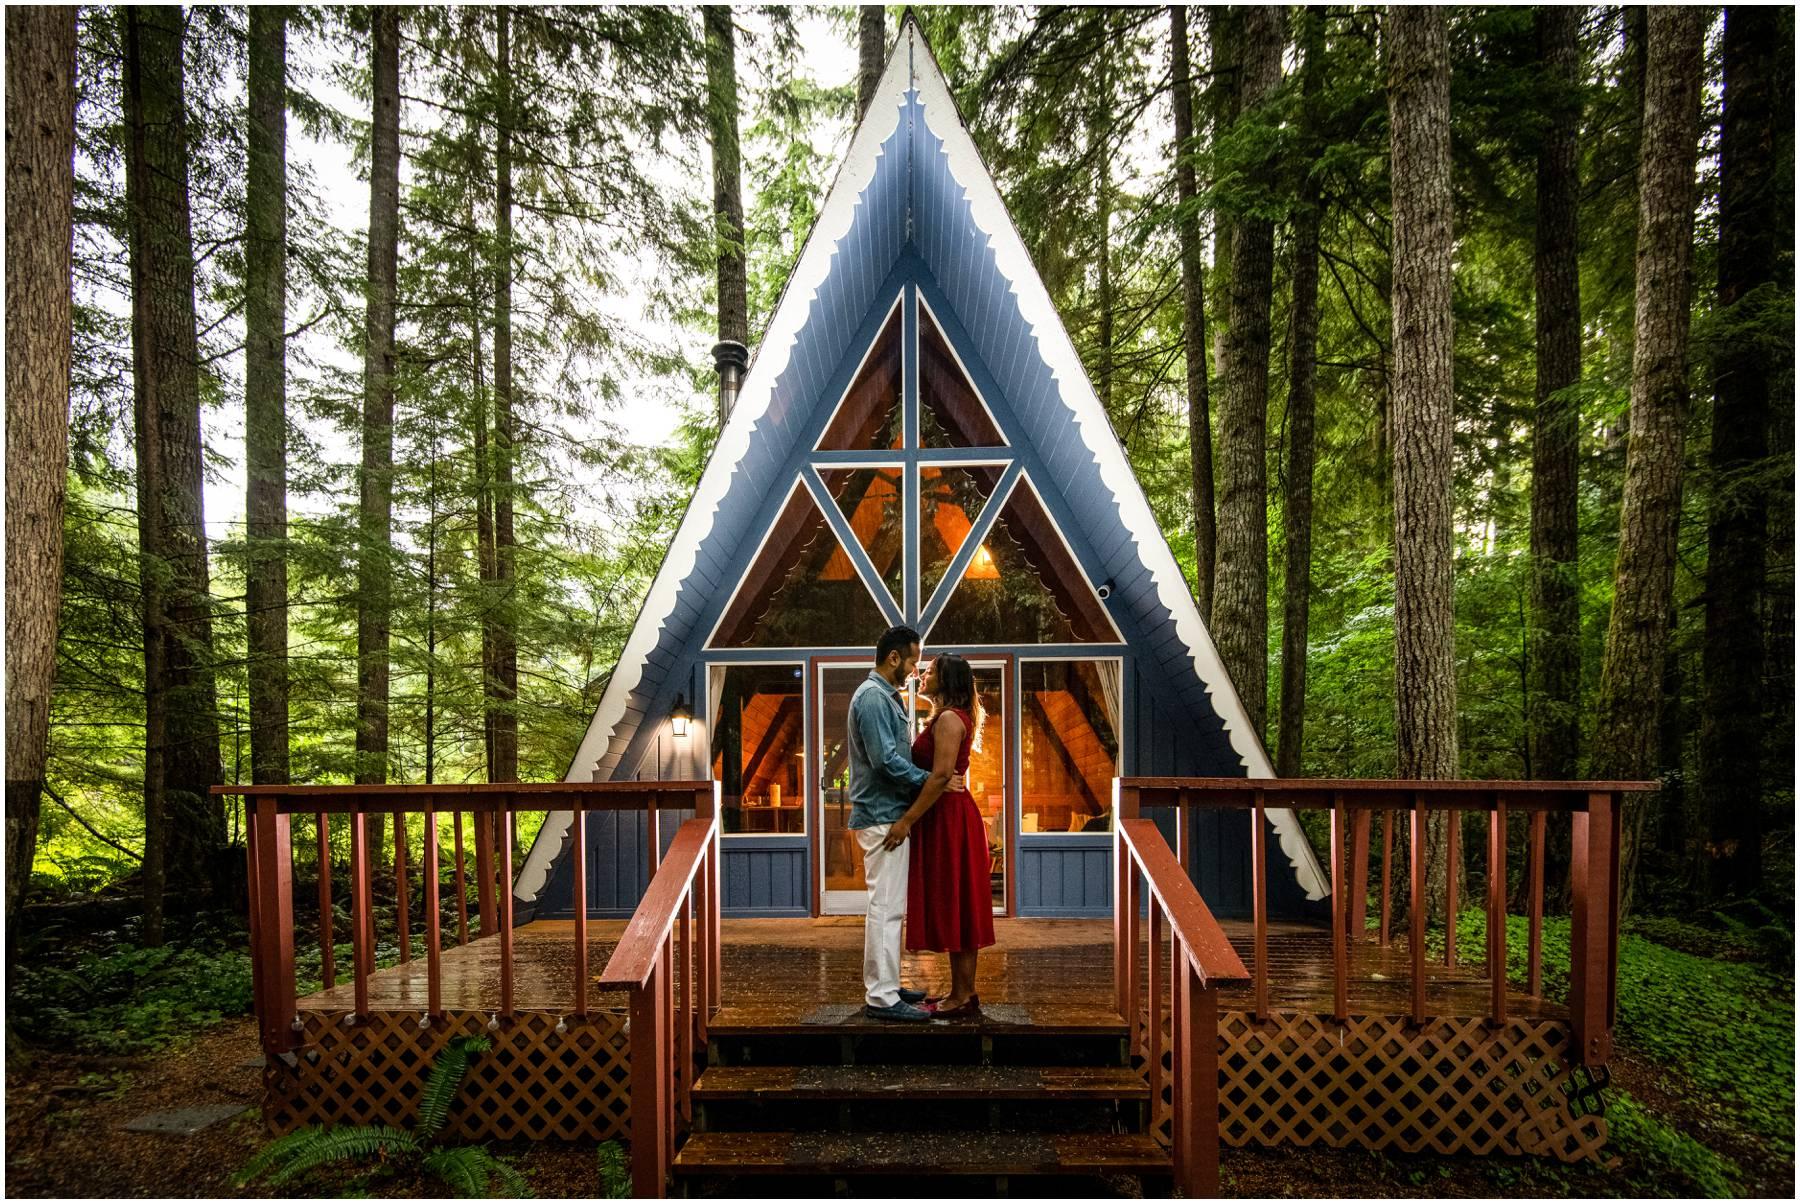 Airbnb in Ashford near Mt. Rainier.